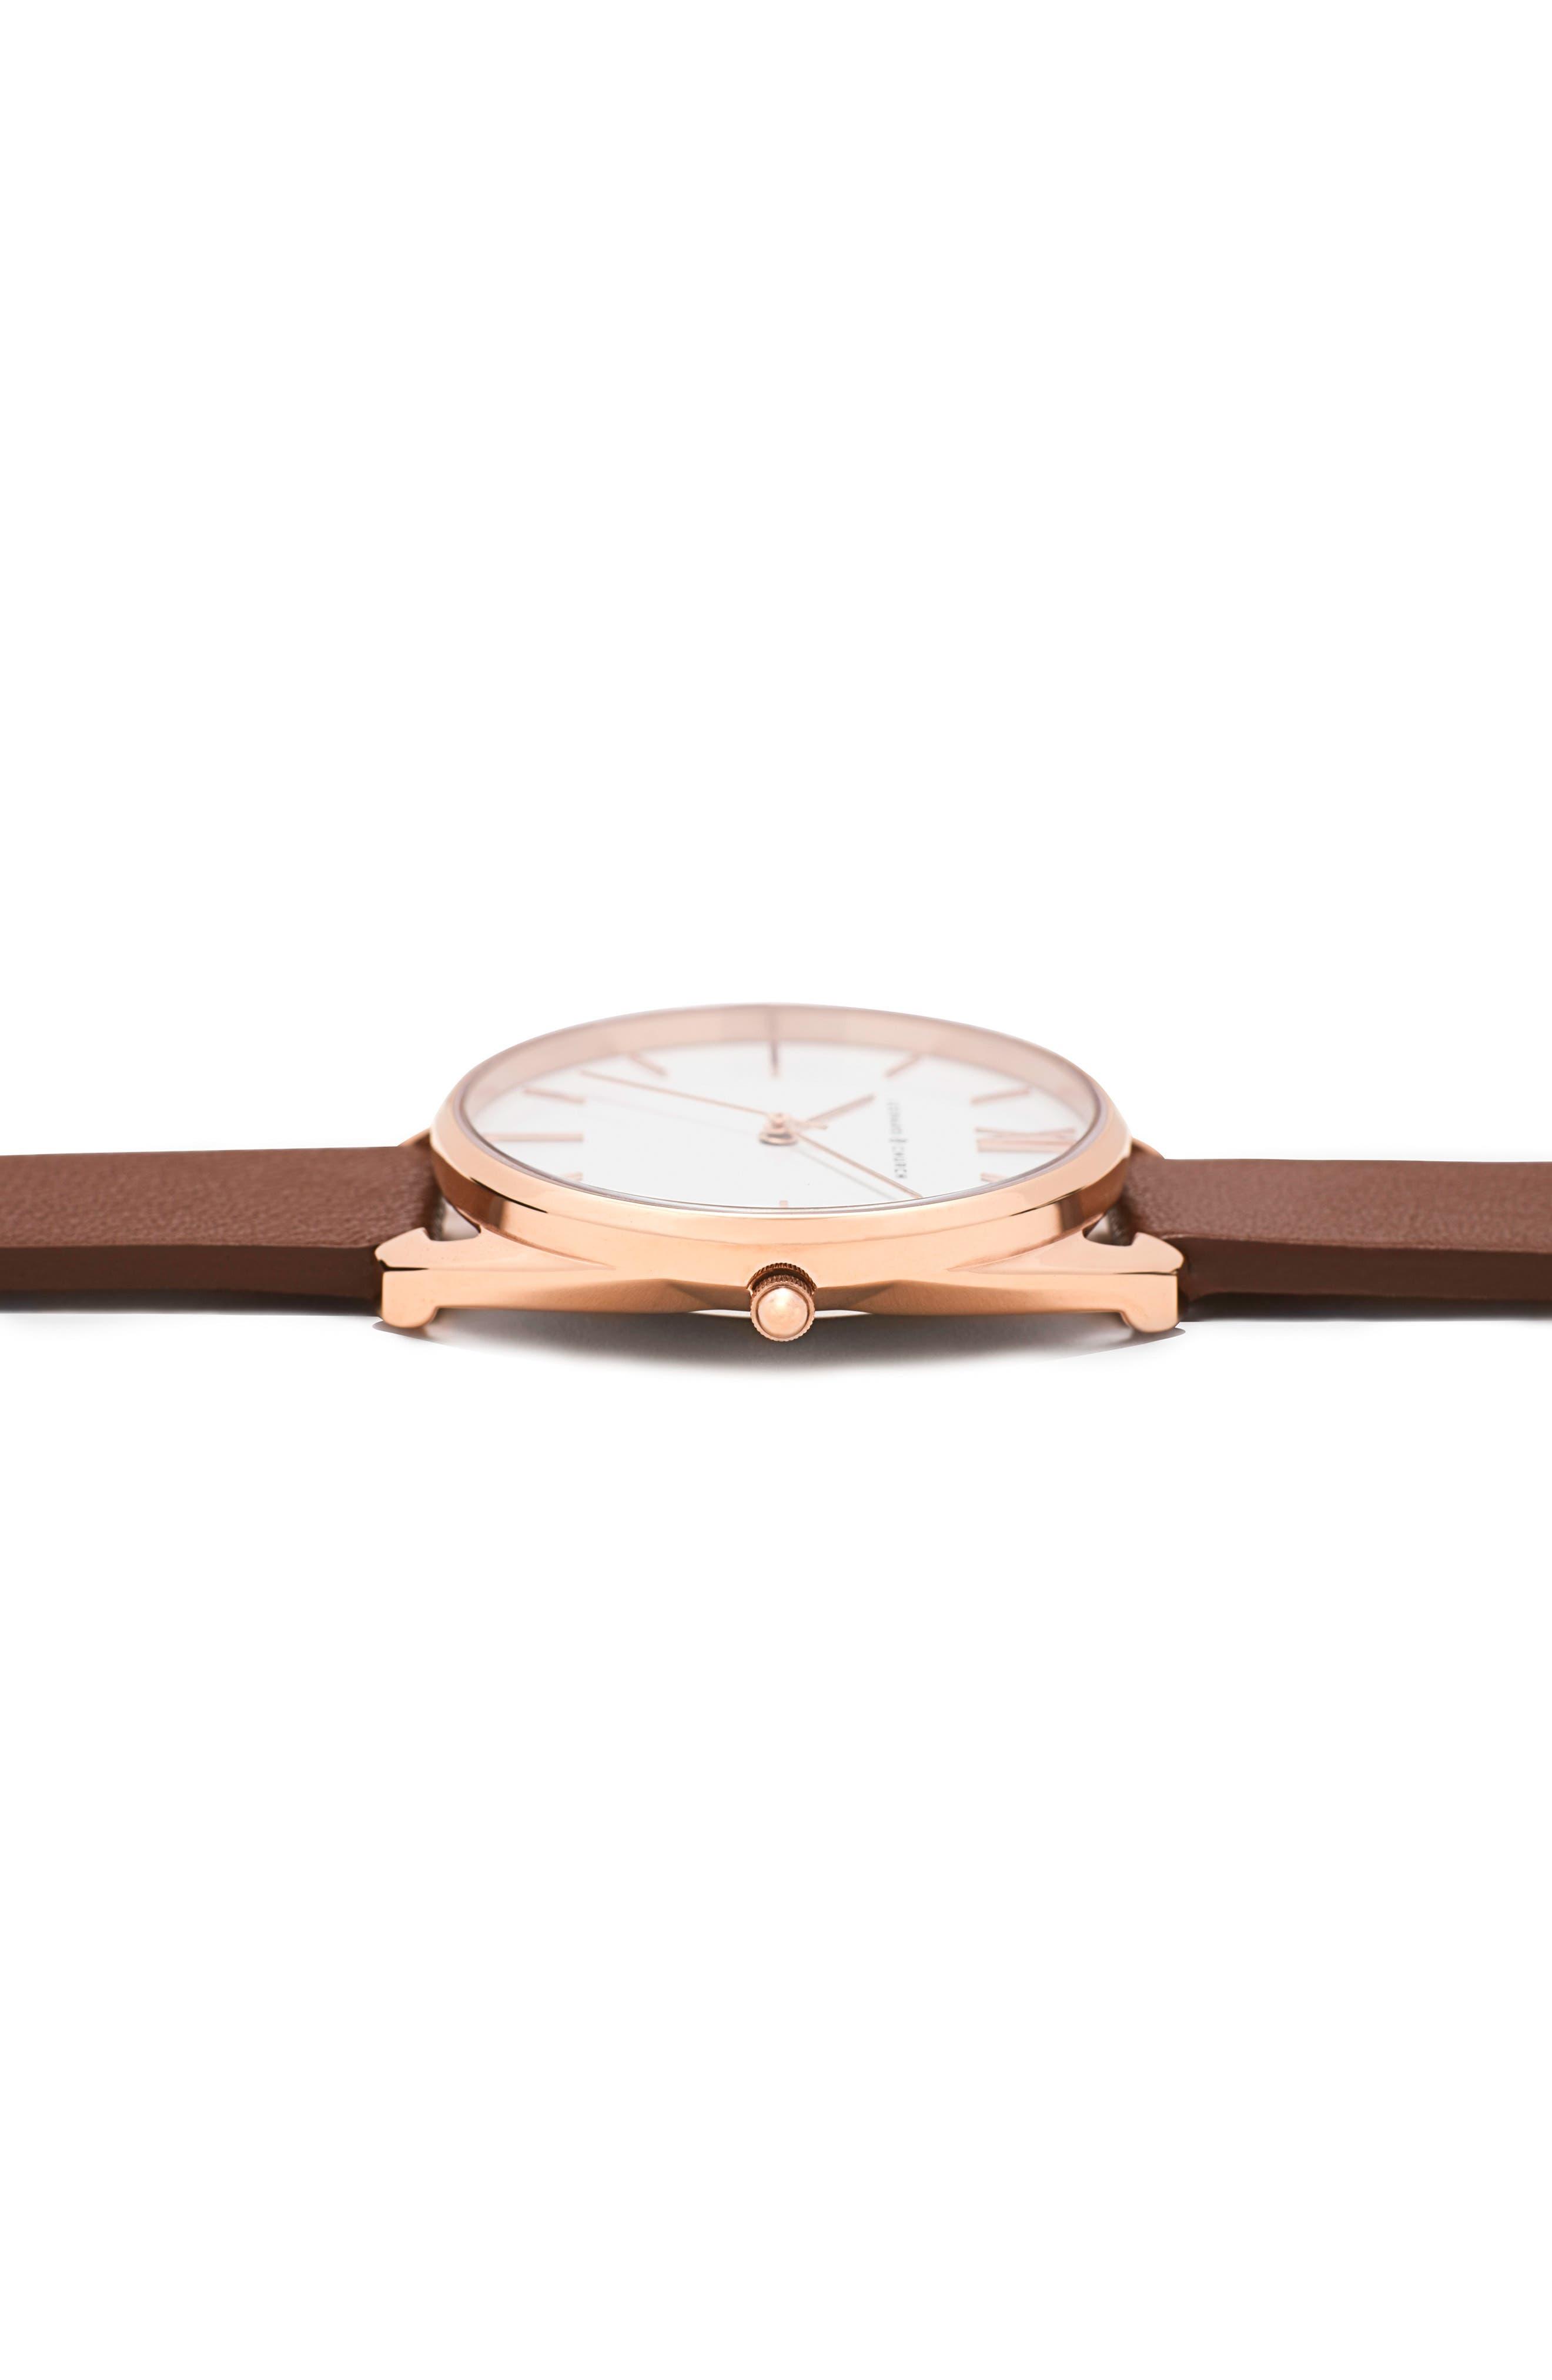 Leonard & Church Chelsea Leather Strap Watch, 34mm,                             Alternate thumbnail 12, color,